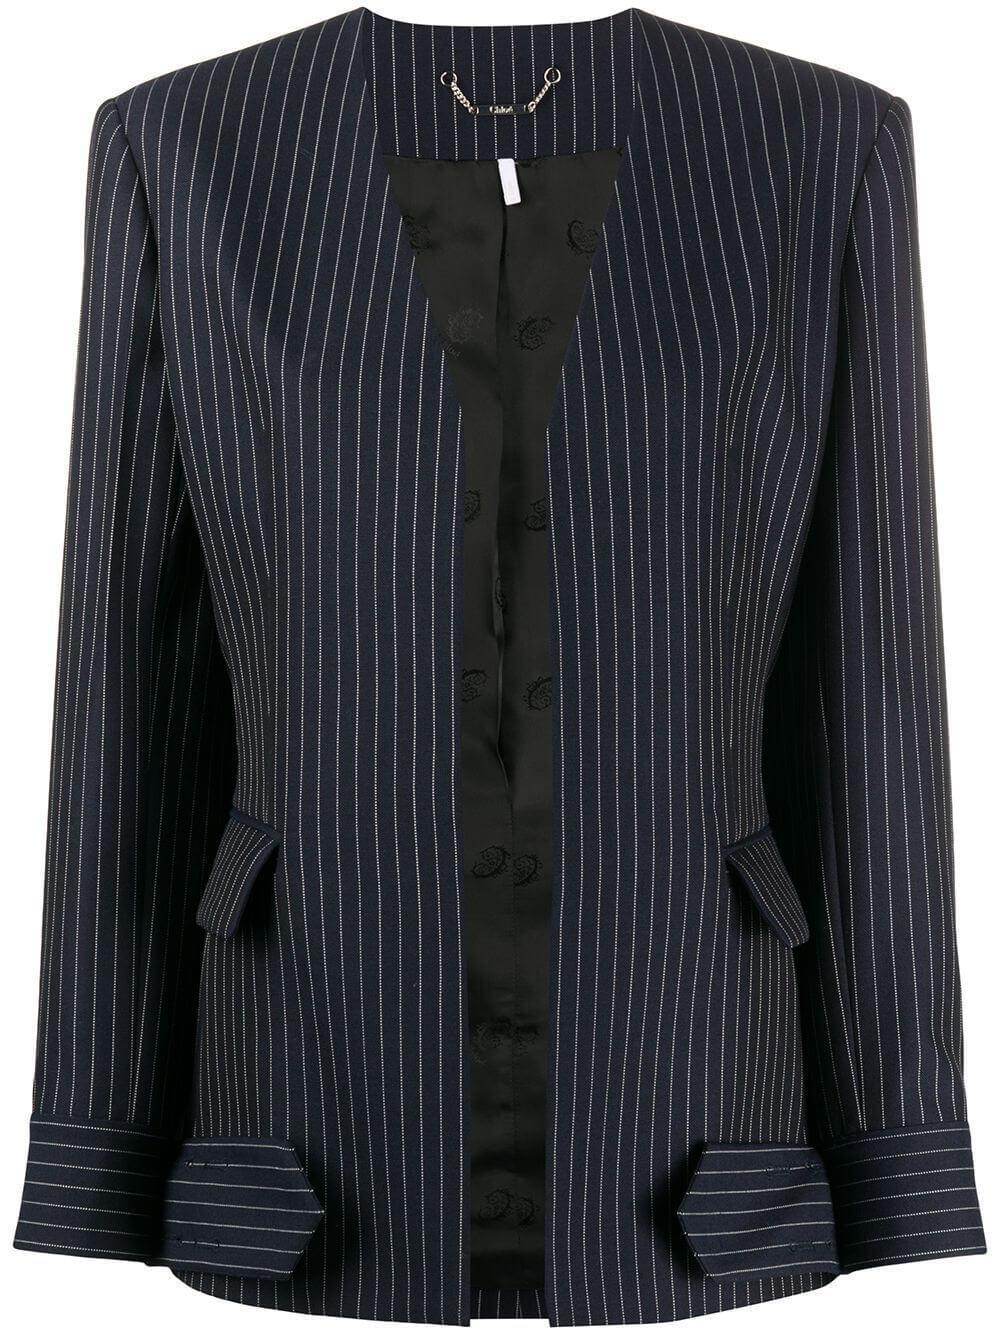 Summer Pinstripe Wool Collarless Jacket Item # CHC20UVE12063